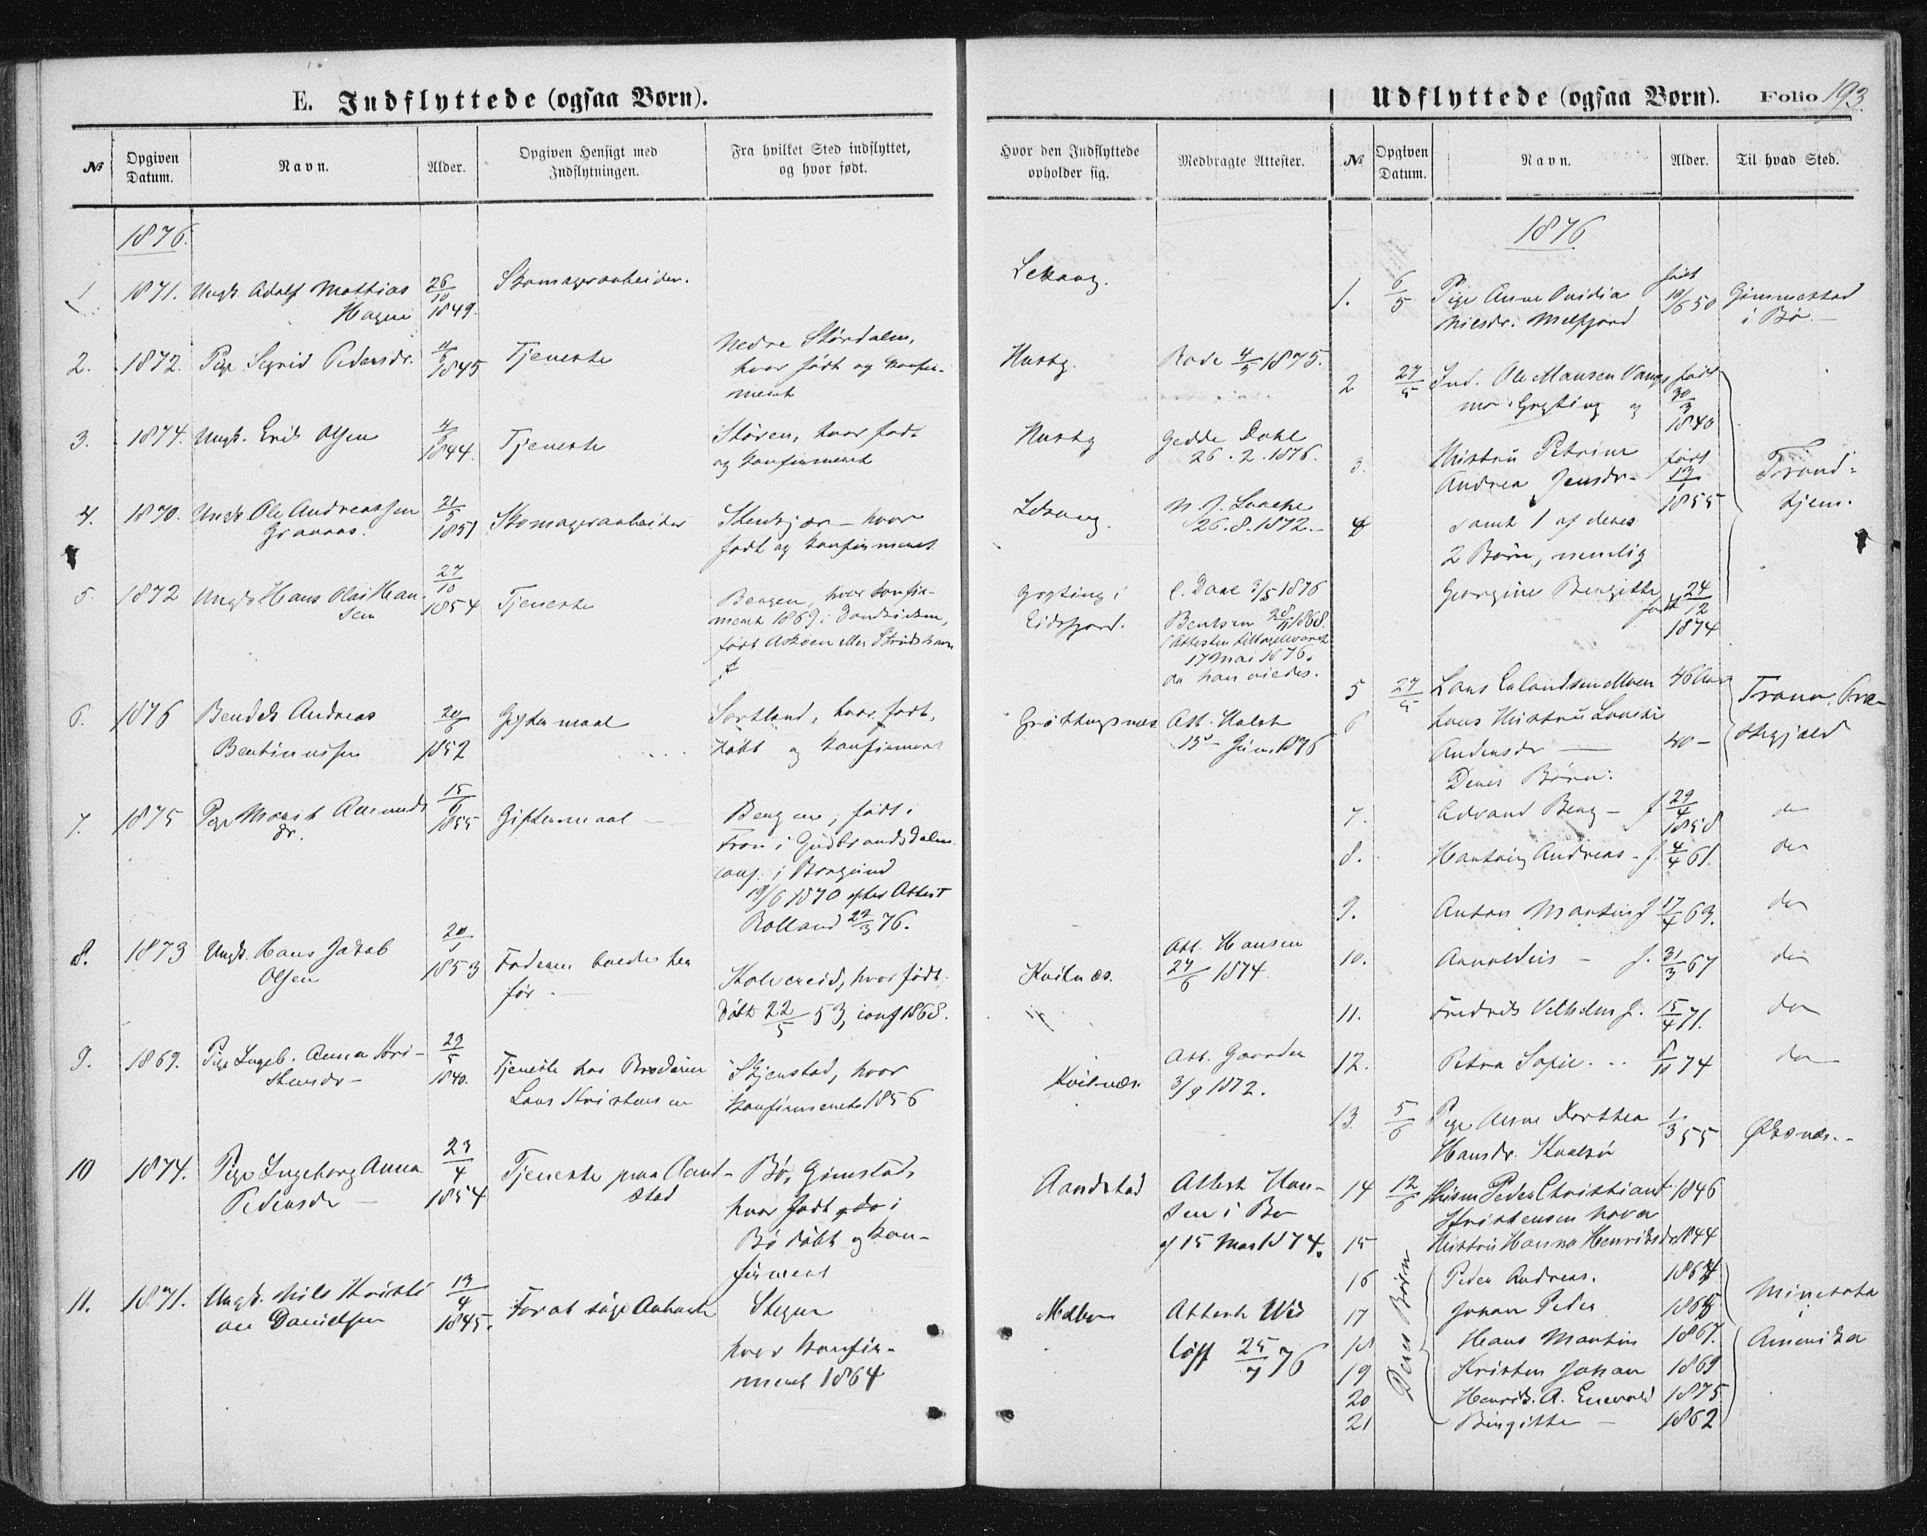 SAT, Ministerialprotokoller, klokkerbøker og fødselsregistre - Nordland, 888/L1243: Ministerialbok nr. 888A09, 1876-1879, s. 193